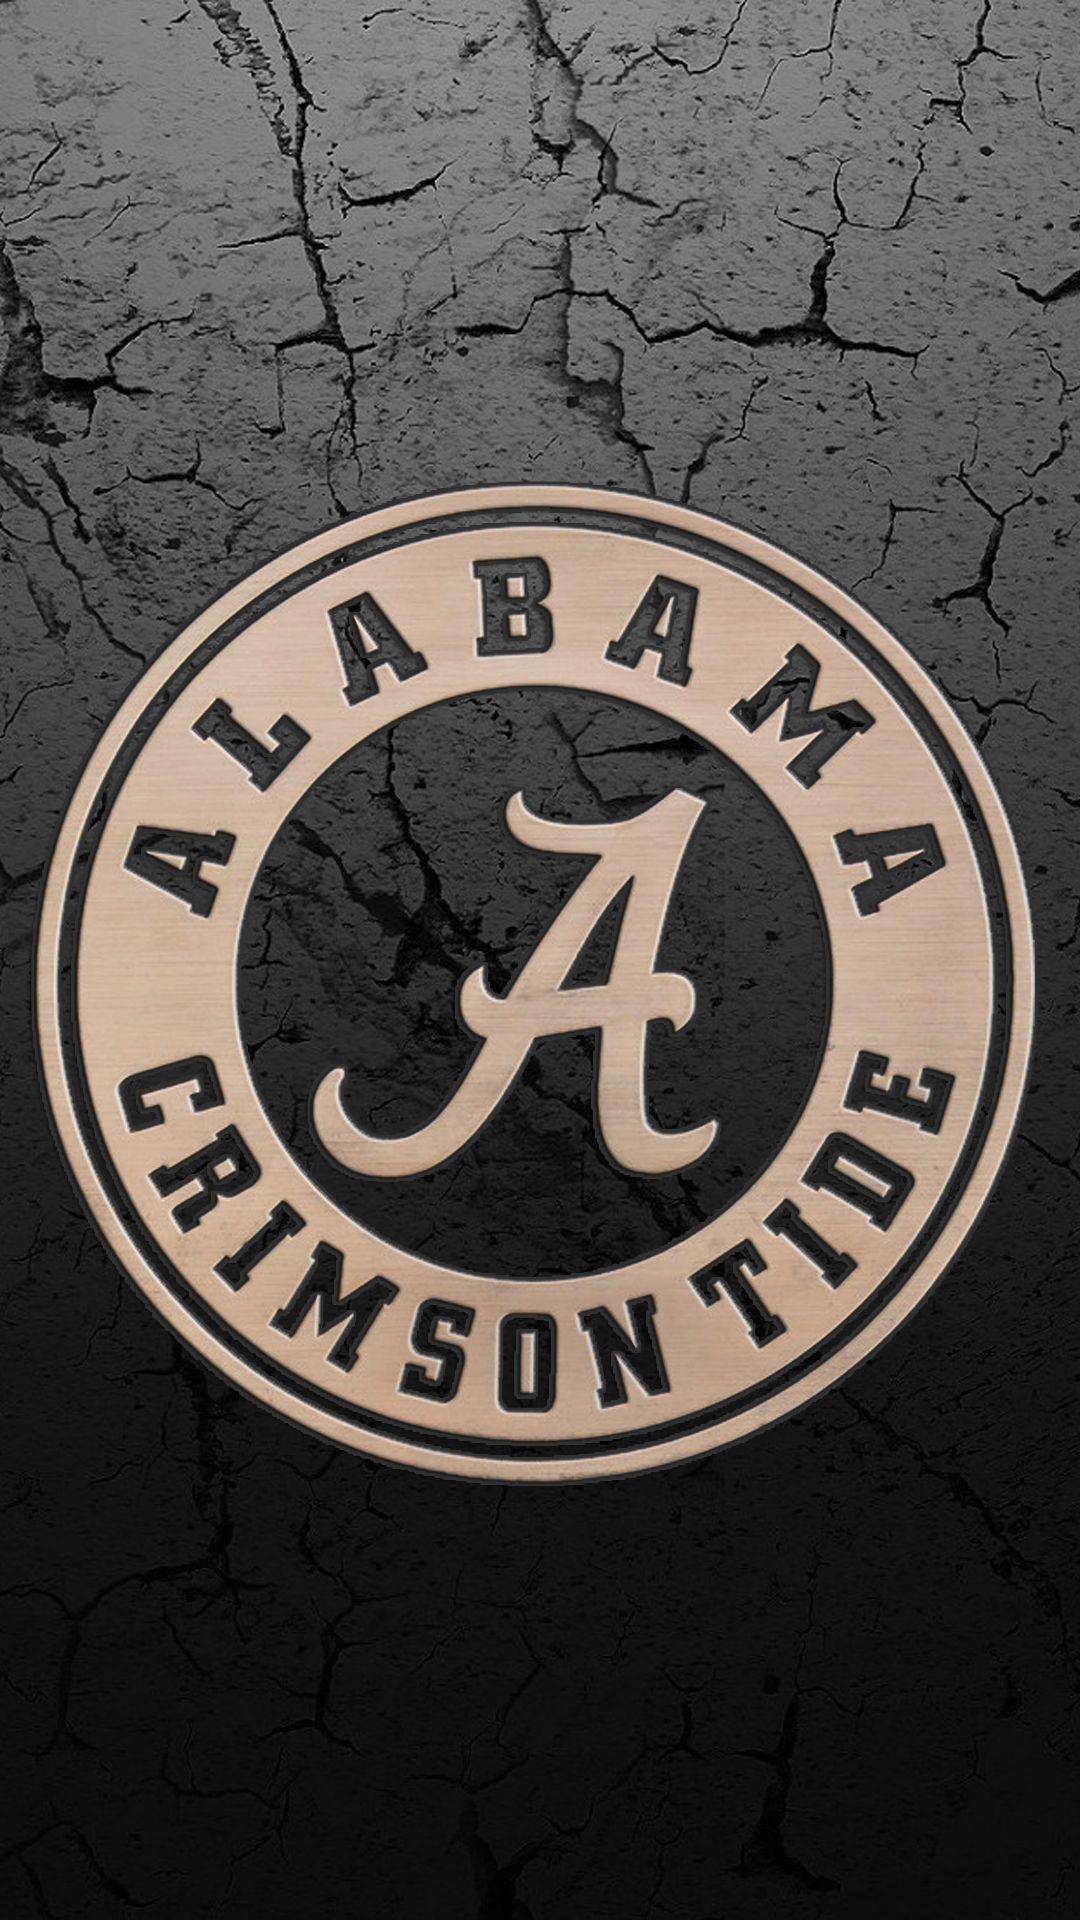 Free Alabama Crimson Tide Wallpapers Wallpaper Hd Wallpapers Alabama Crimson Tide Graduation Gifts For Guys Alabama